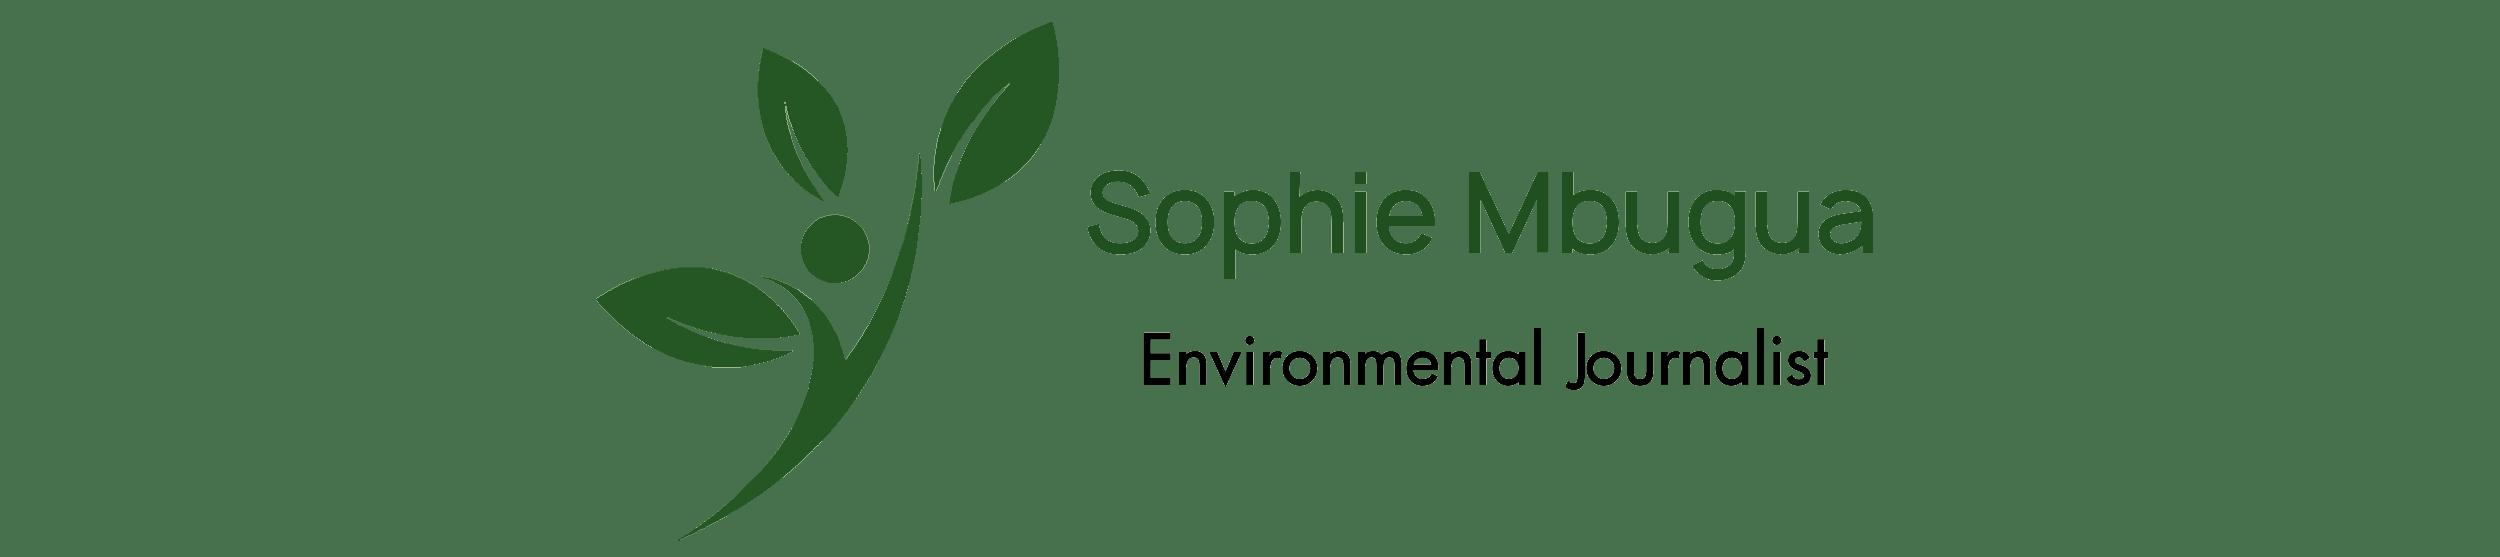 Sophie Mbugua